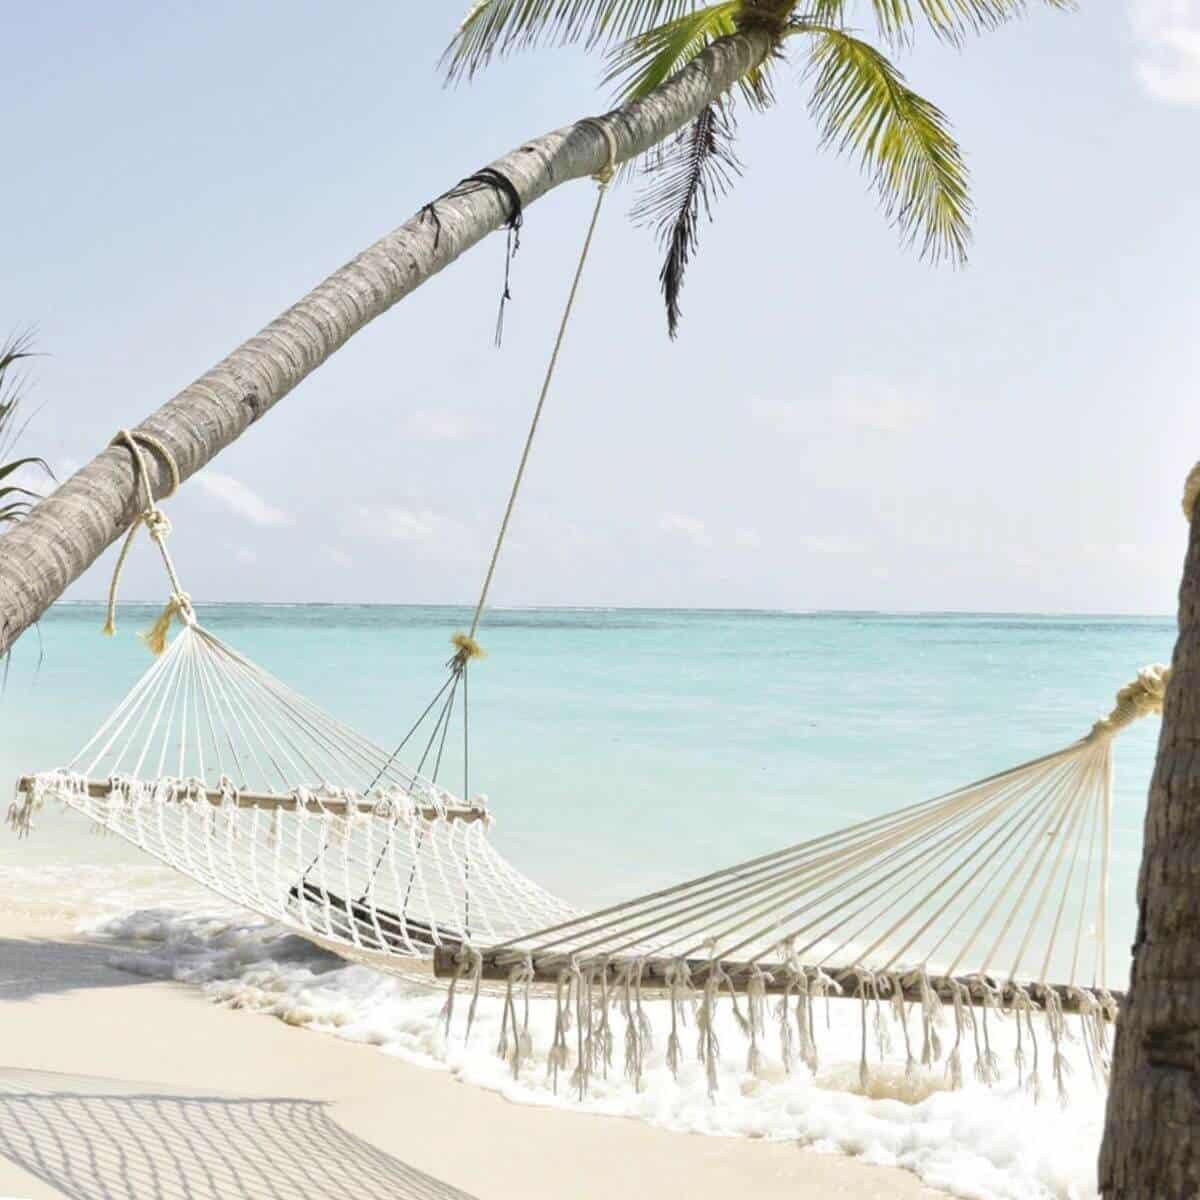 Hammock on a beach with palm trees.